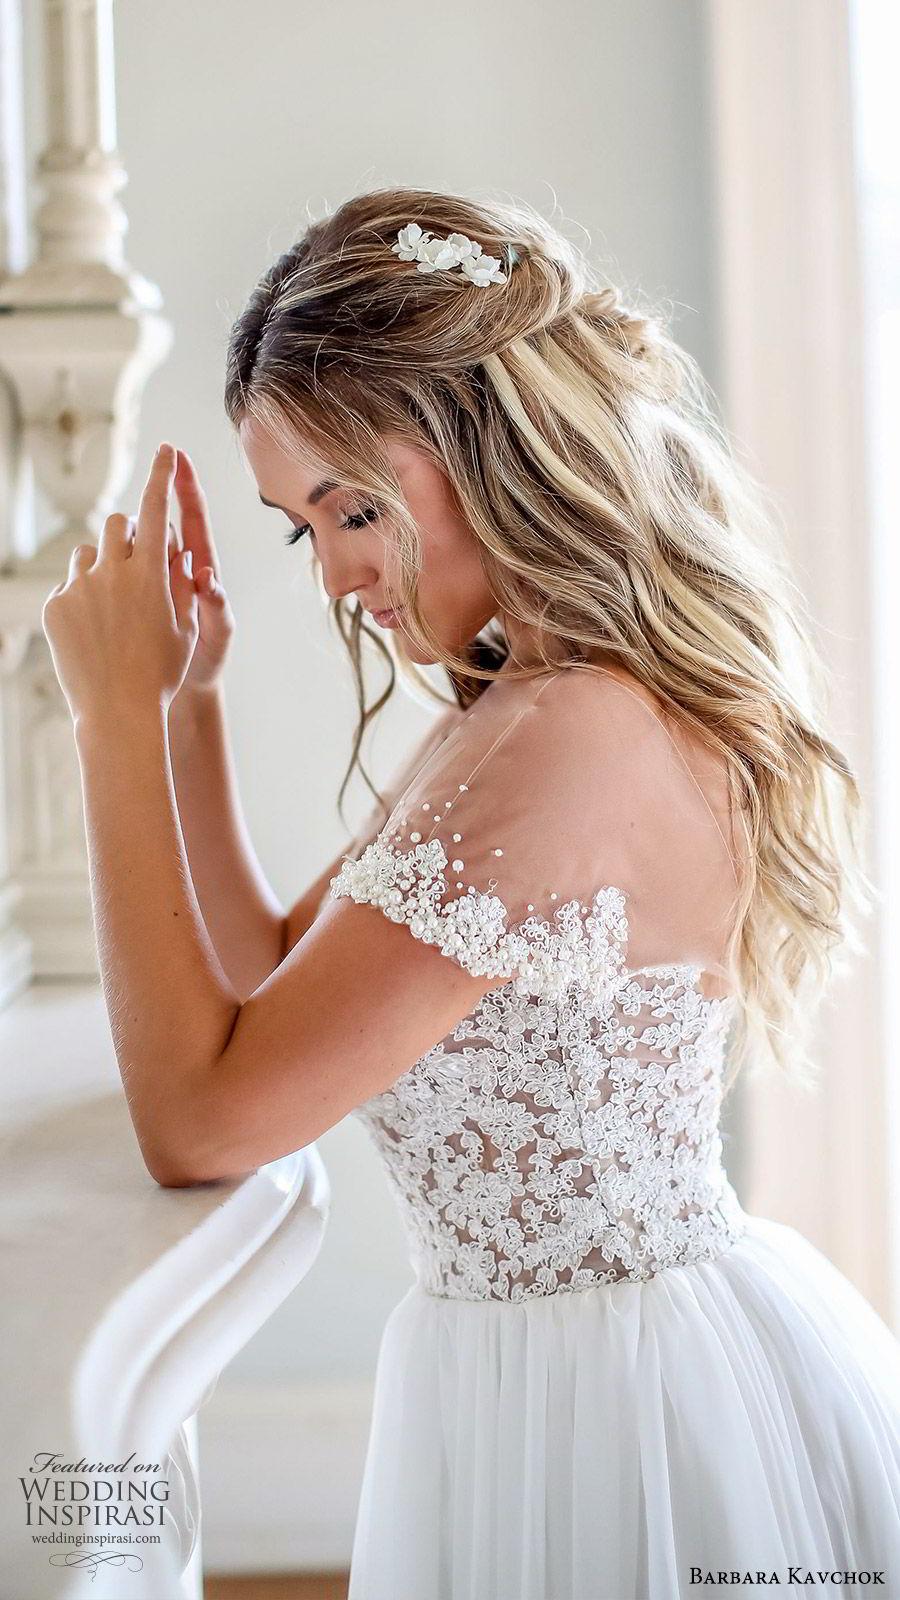 barbara kavchok fall 2019 bridal illusion bateau off shoulder embellished bodice soft a line wedding dress (2) zv chapel train romantic elegant